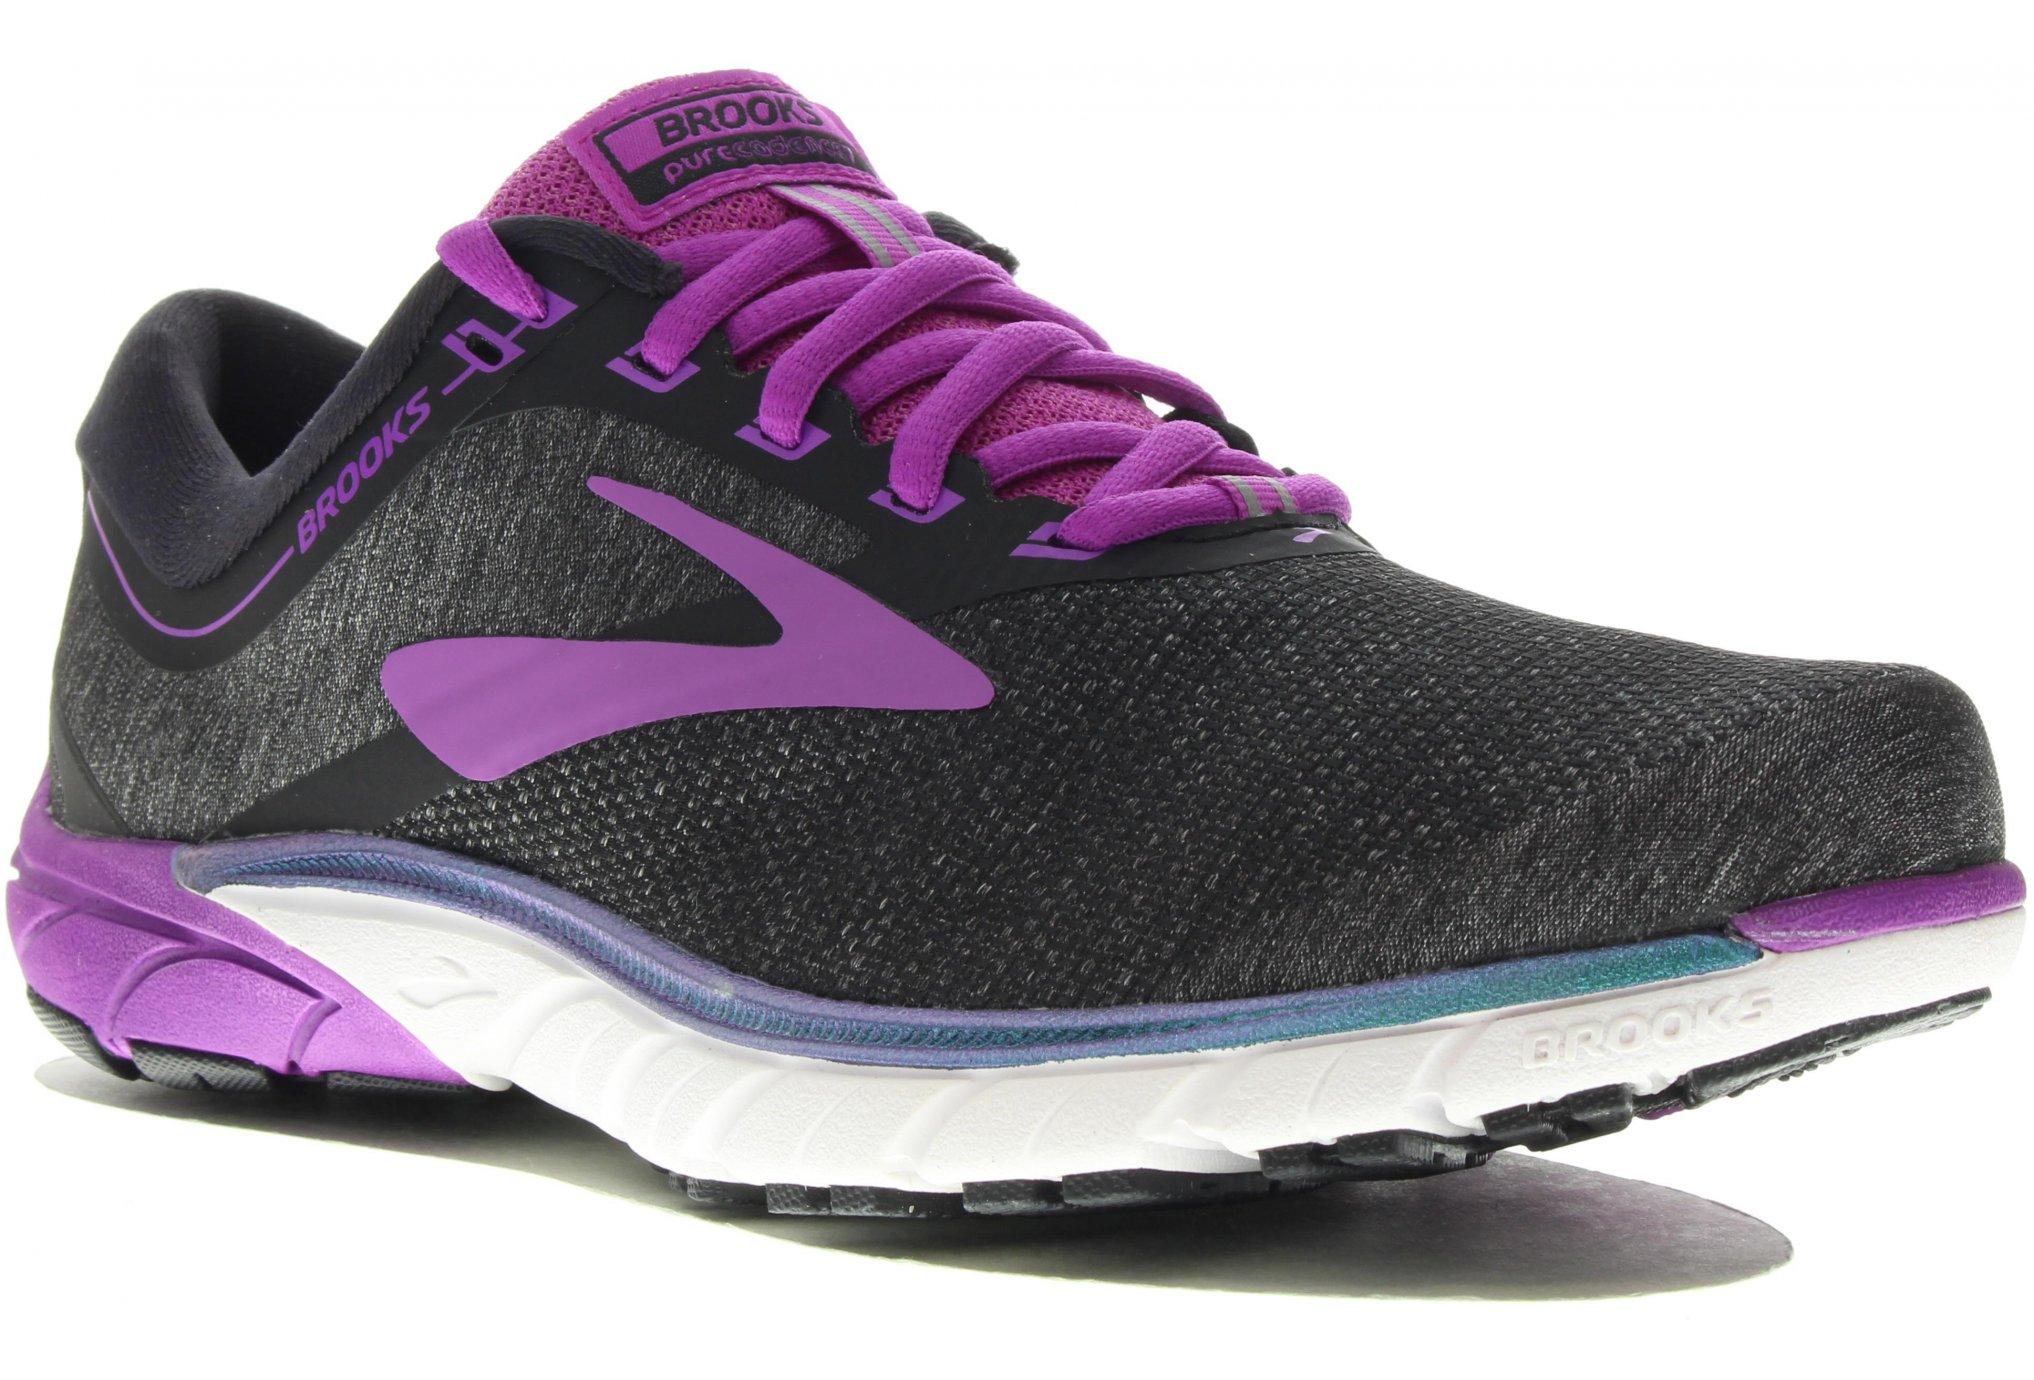 Brooks PureCadence 7 Chaussures running femme